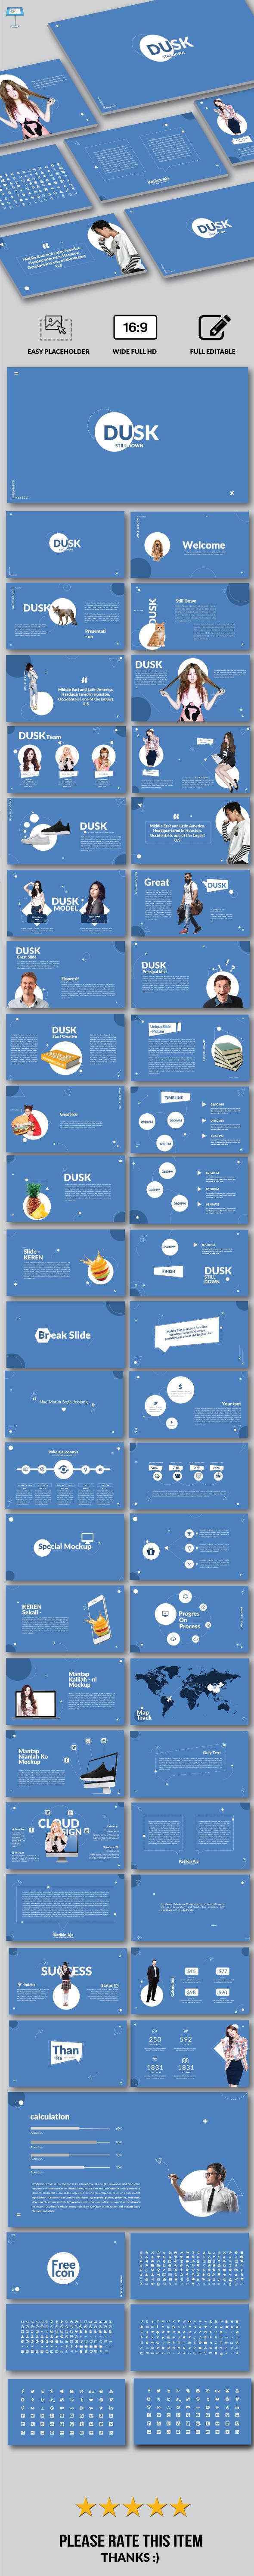 Dusk - Keynote Powerpoint - Keynote Templates Presentation Templates